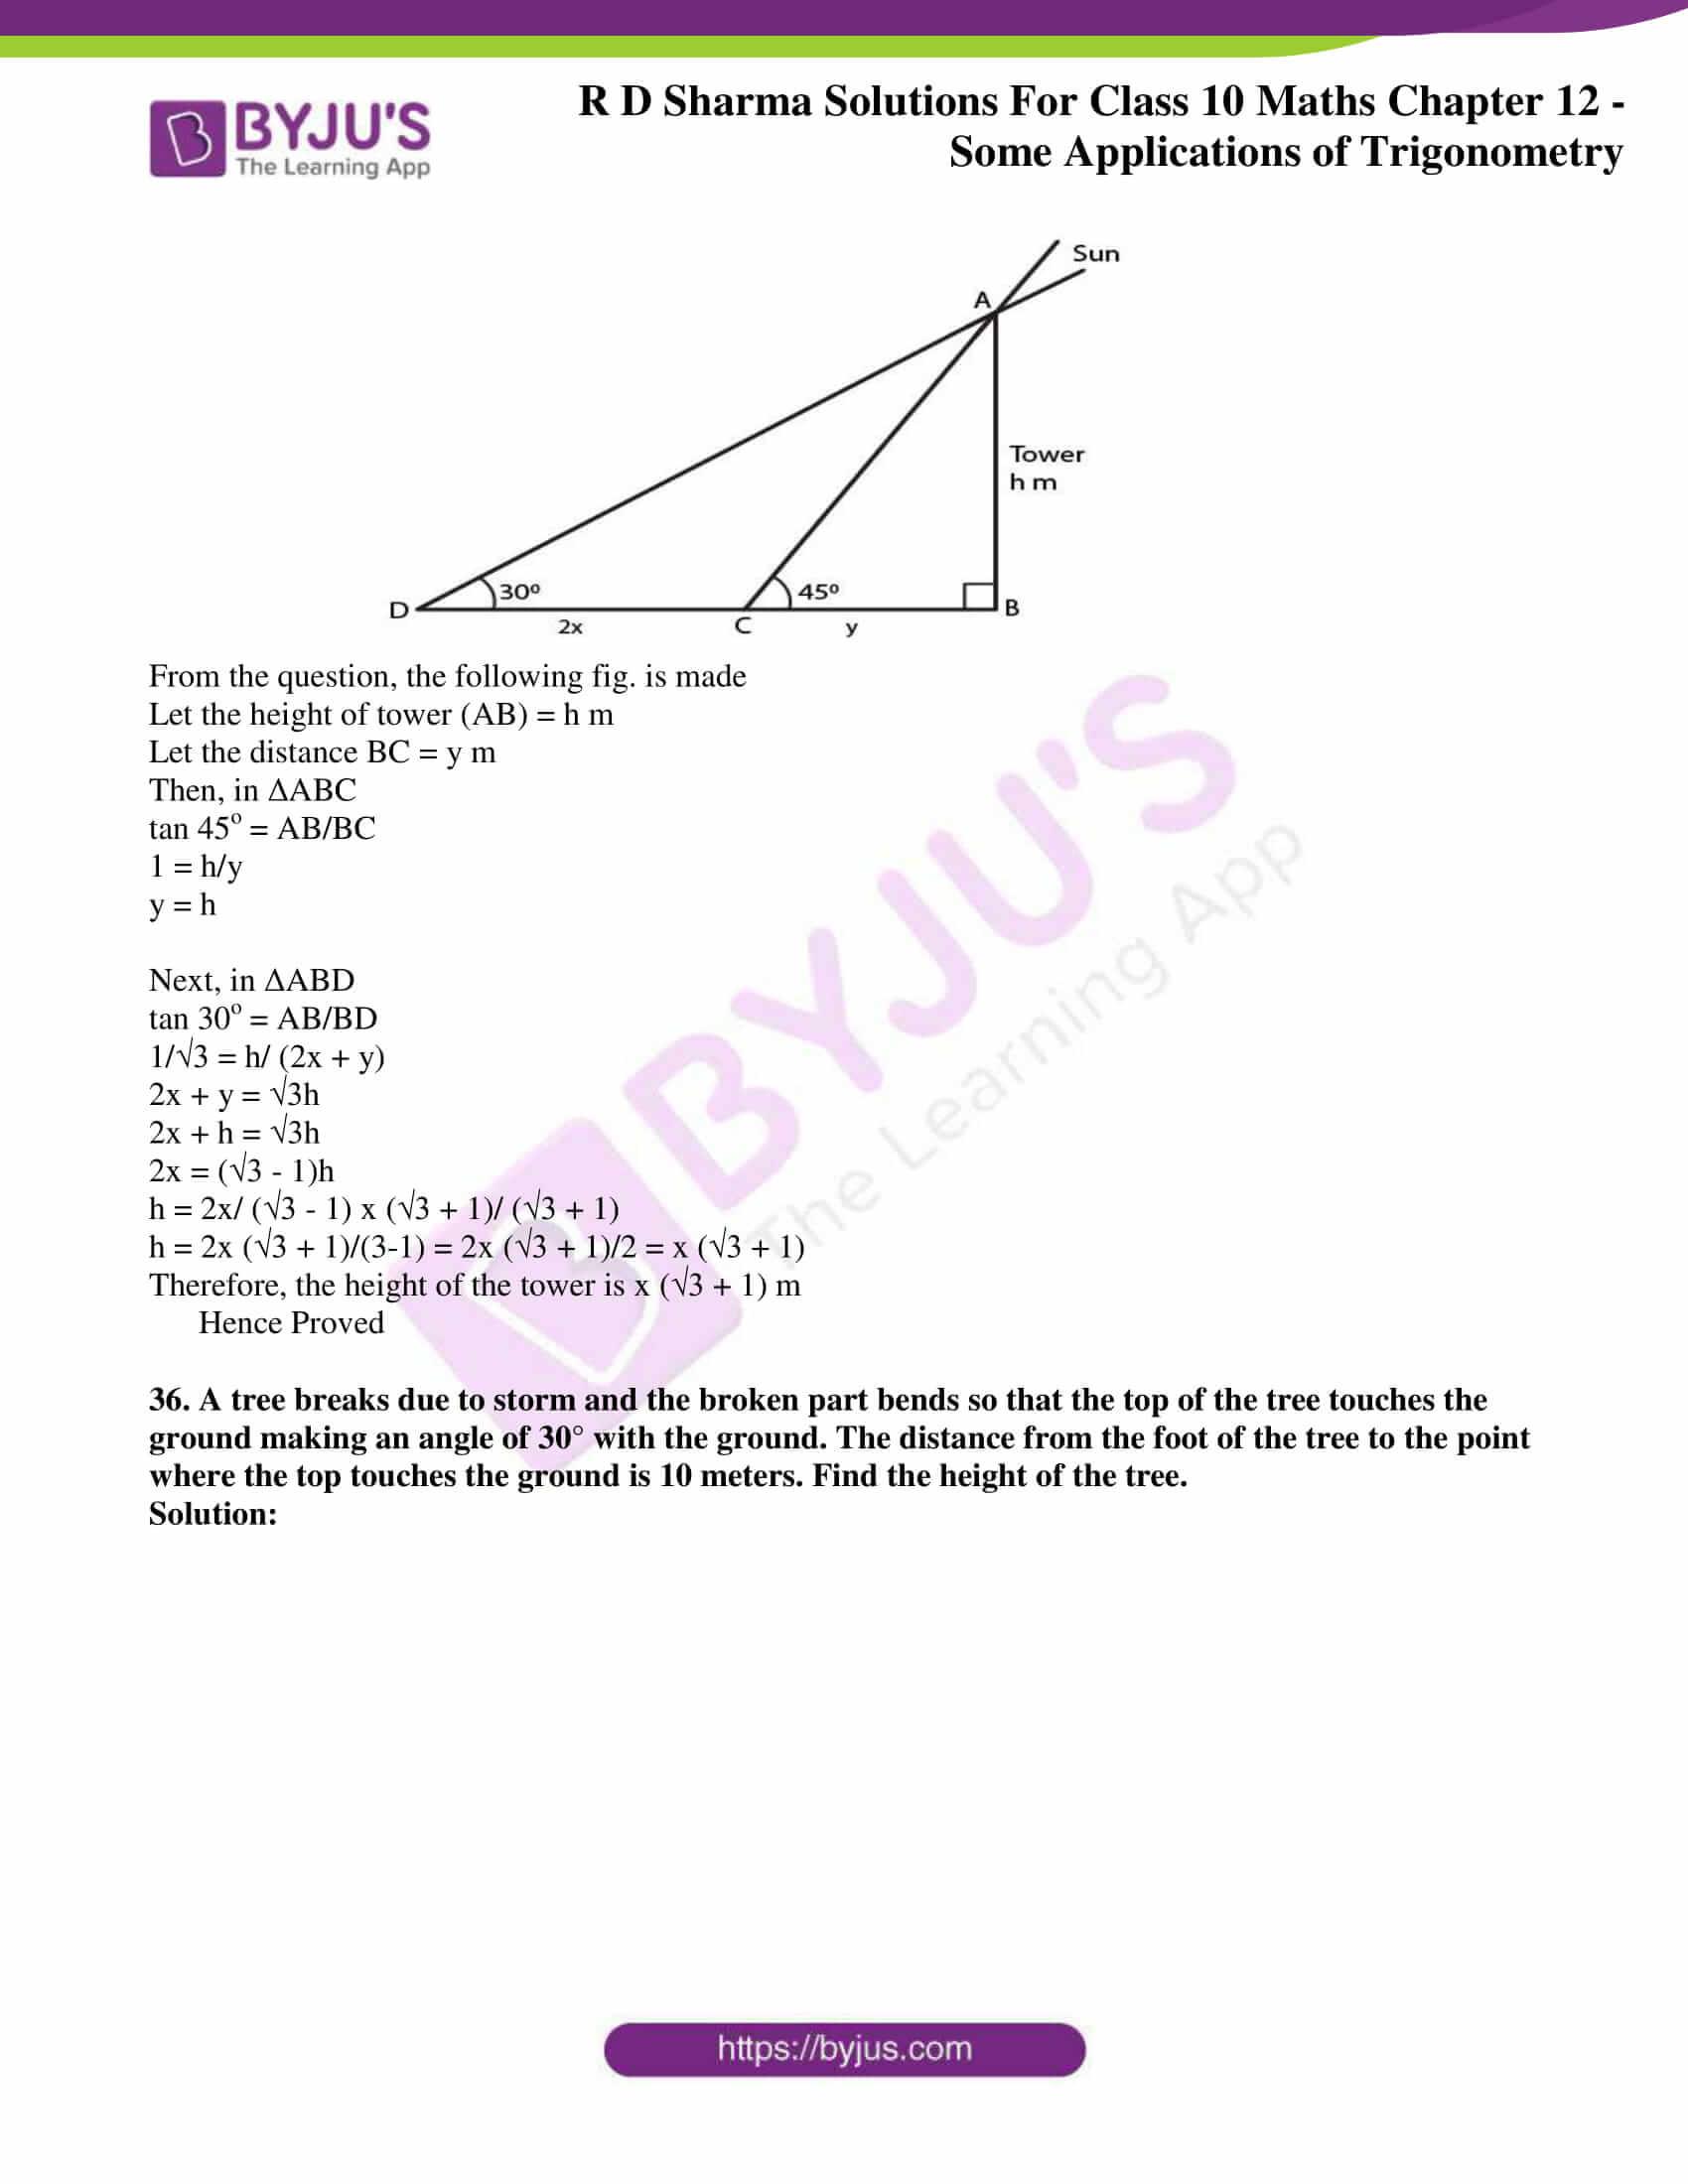 rd sharma class 10 chapter 12 applications trigonometry solutions 34